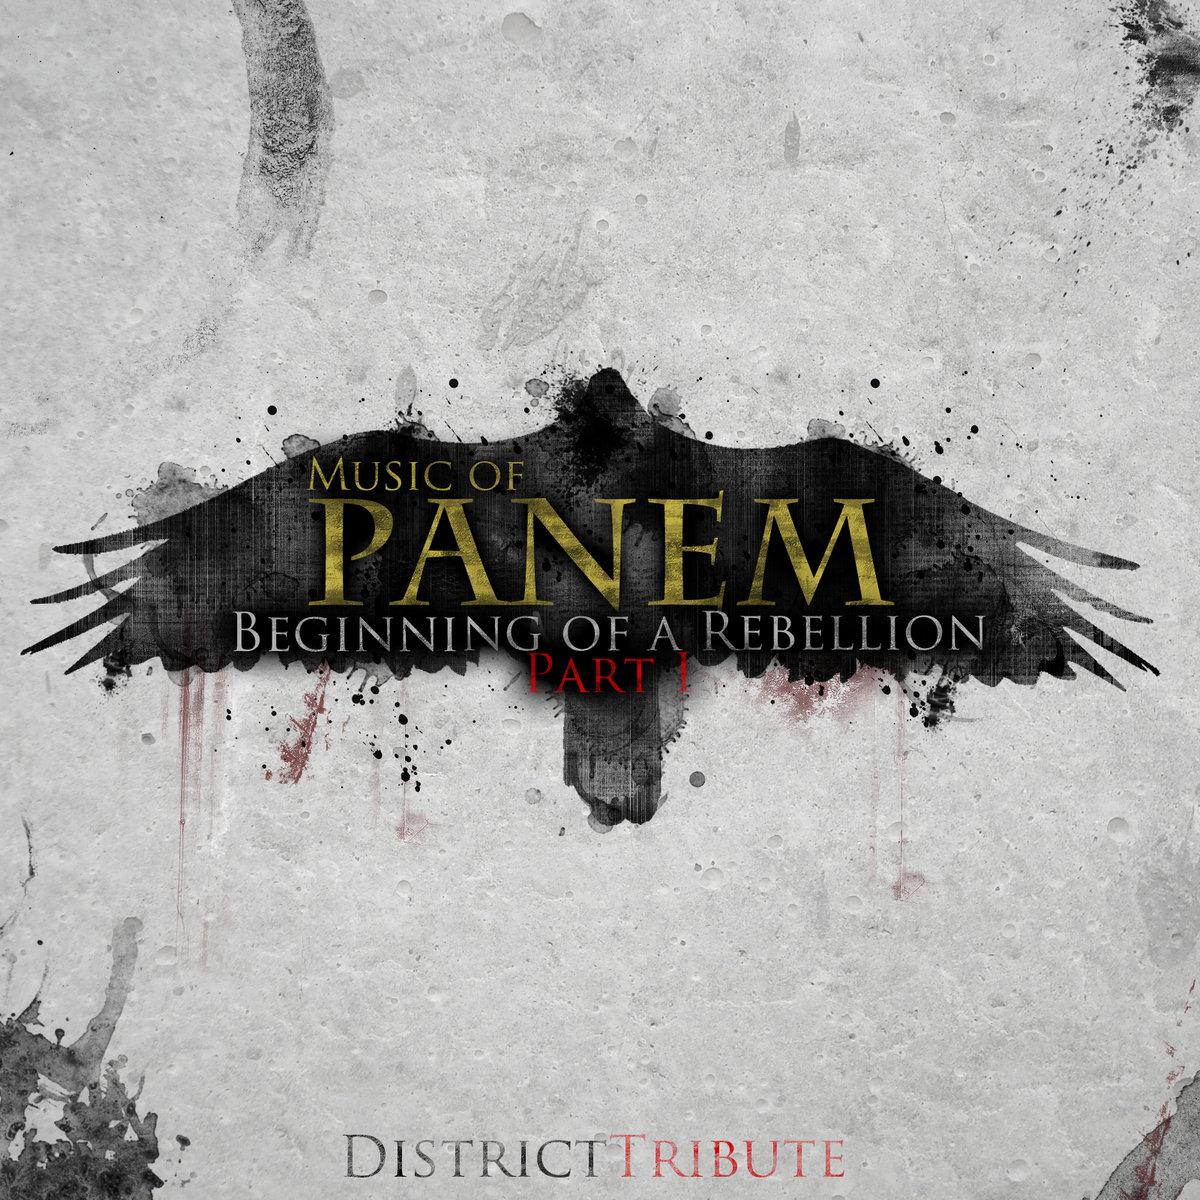 music of panem beginning of a rebellion part i sam cushion